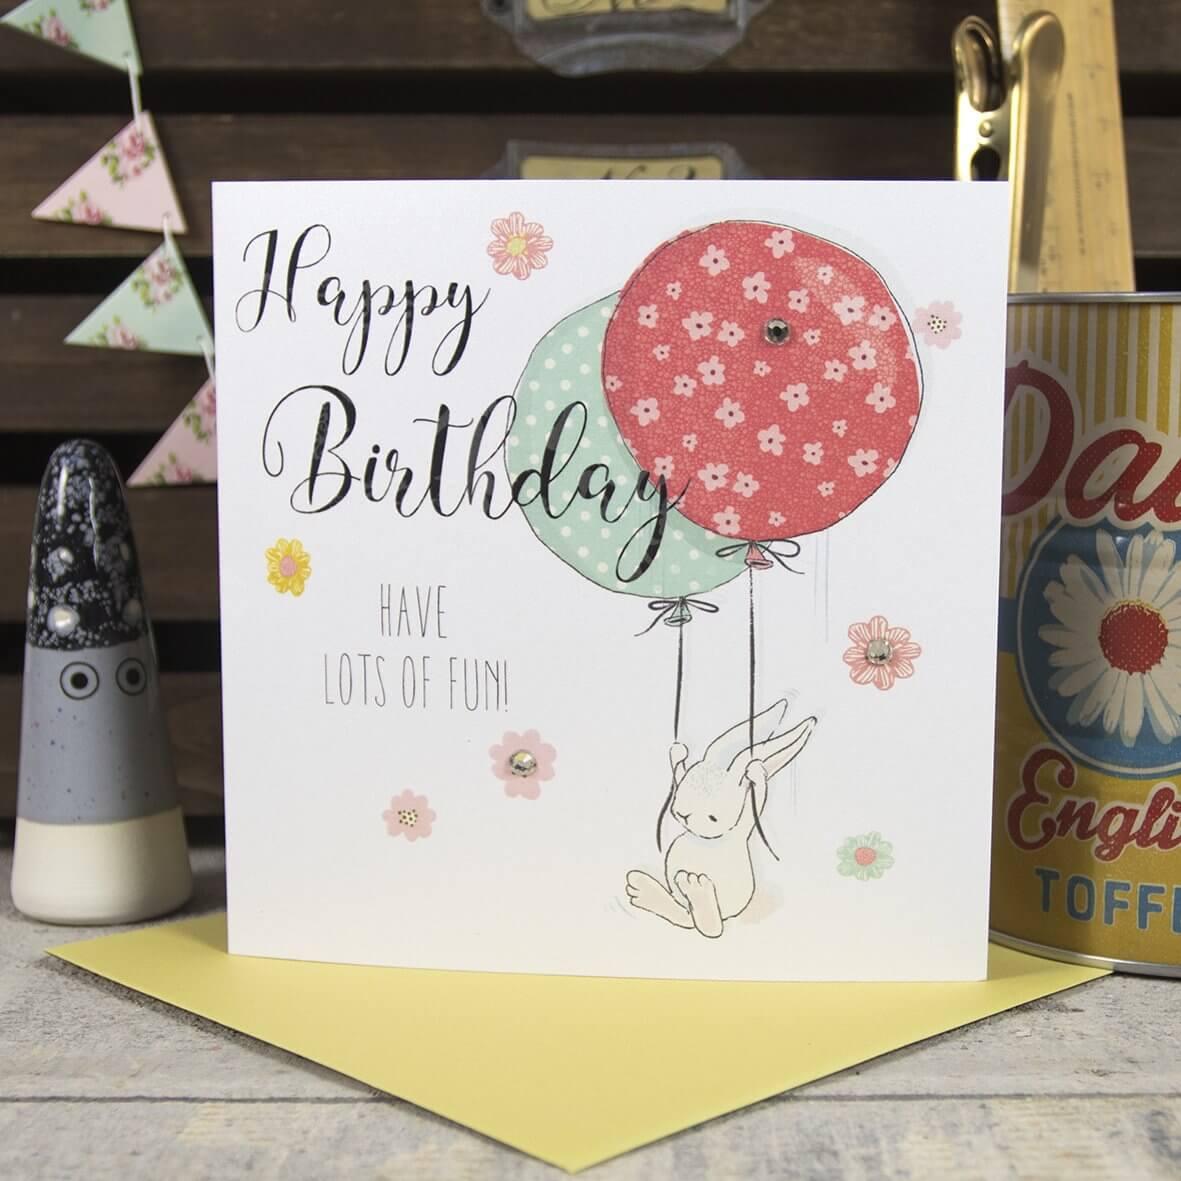 Happy Birthday - have lots of fun